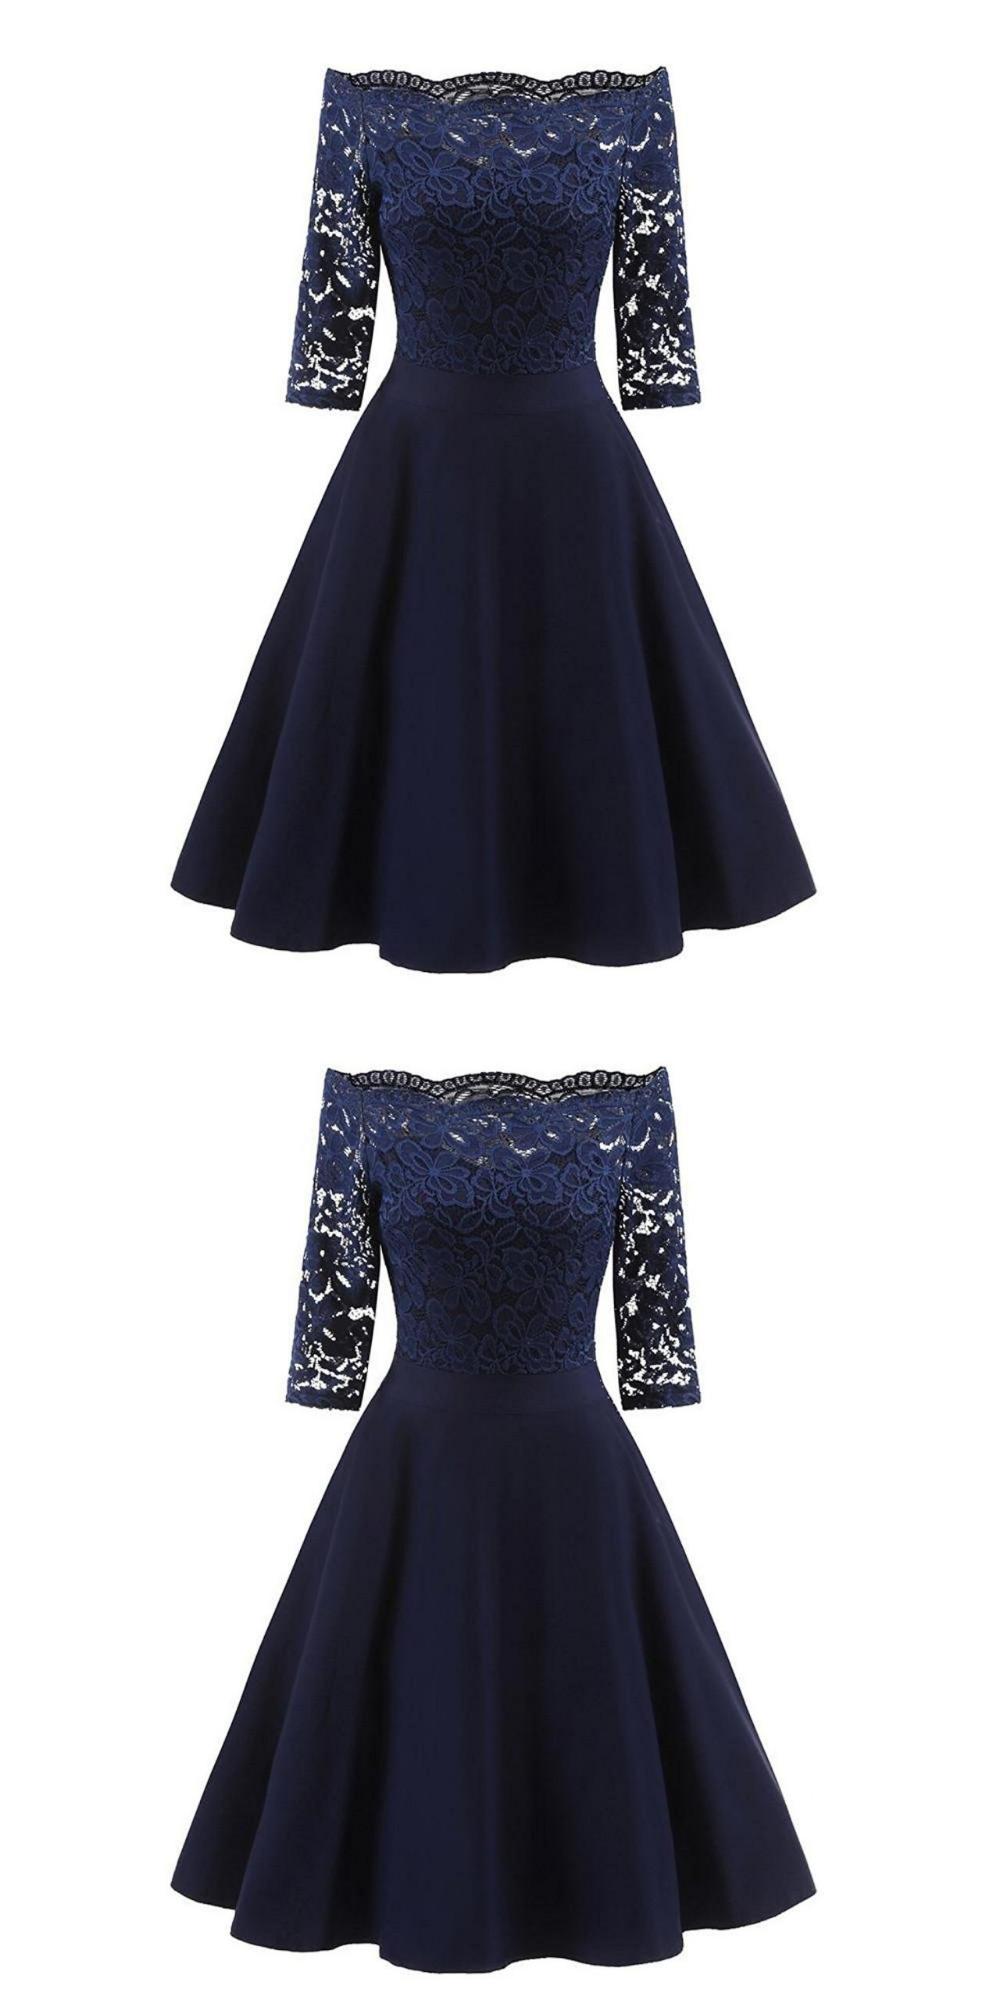 Perfect Navy Blue Homecoming Dress,Off The Shoulder Short Prom Dress,A-Line Graduation Dress,Custom Made Cheap Party Dress